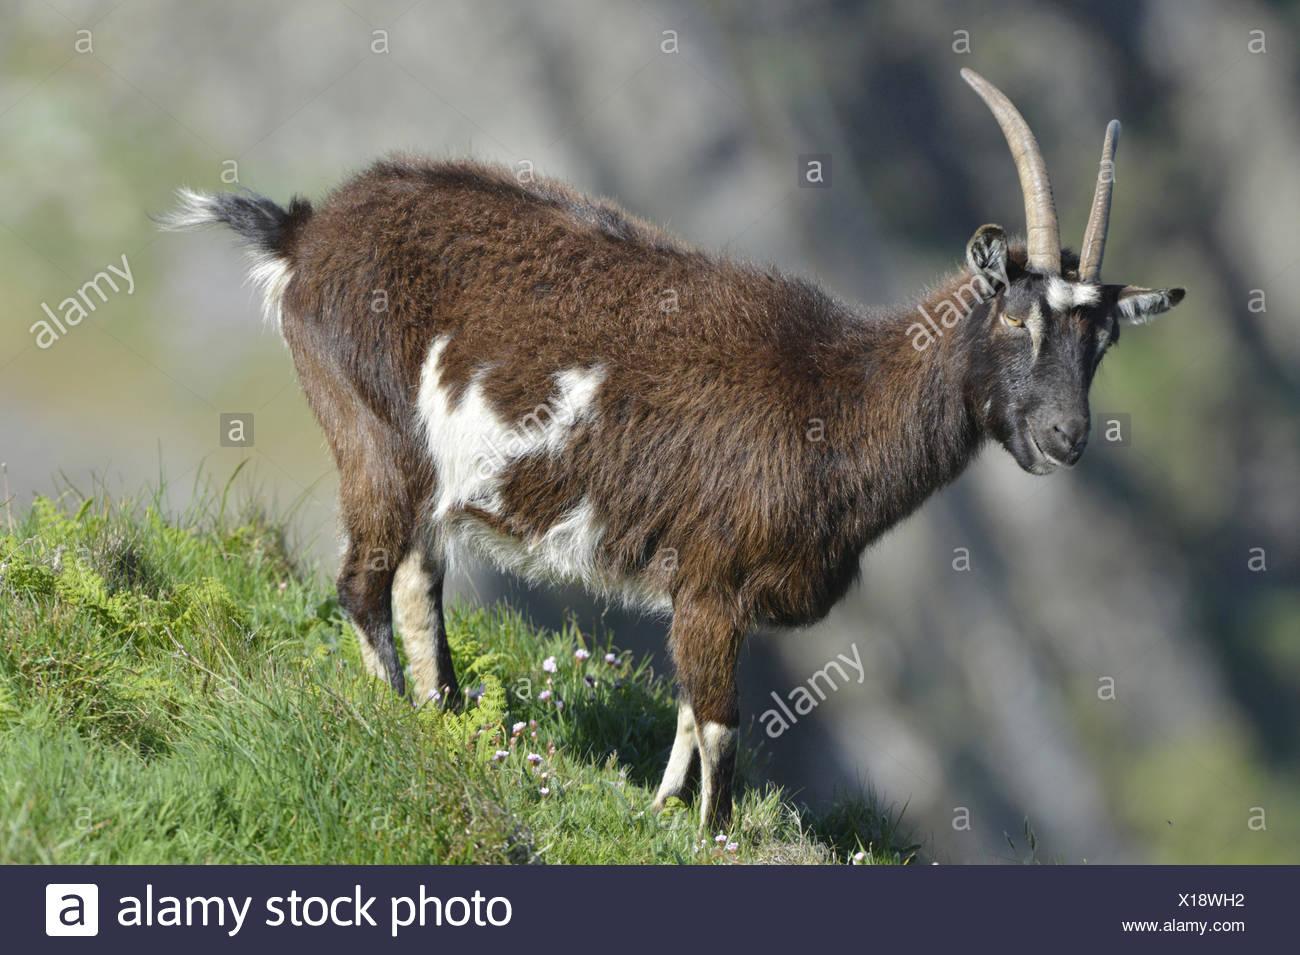 - Cabra Capra hircus Imagen De Stock